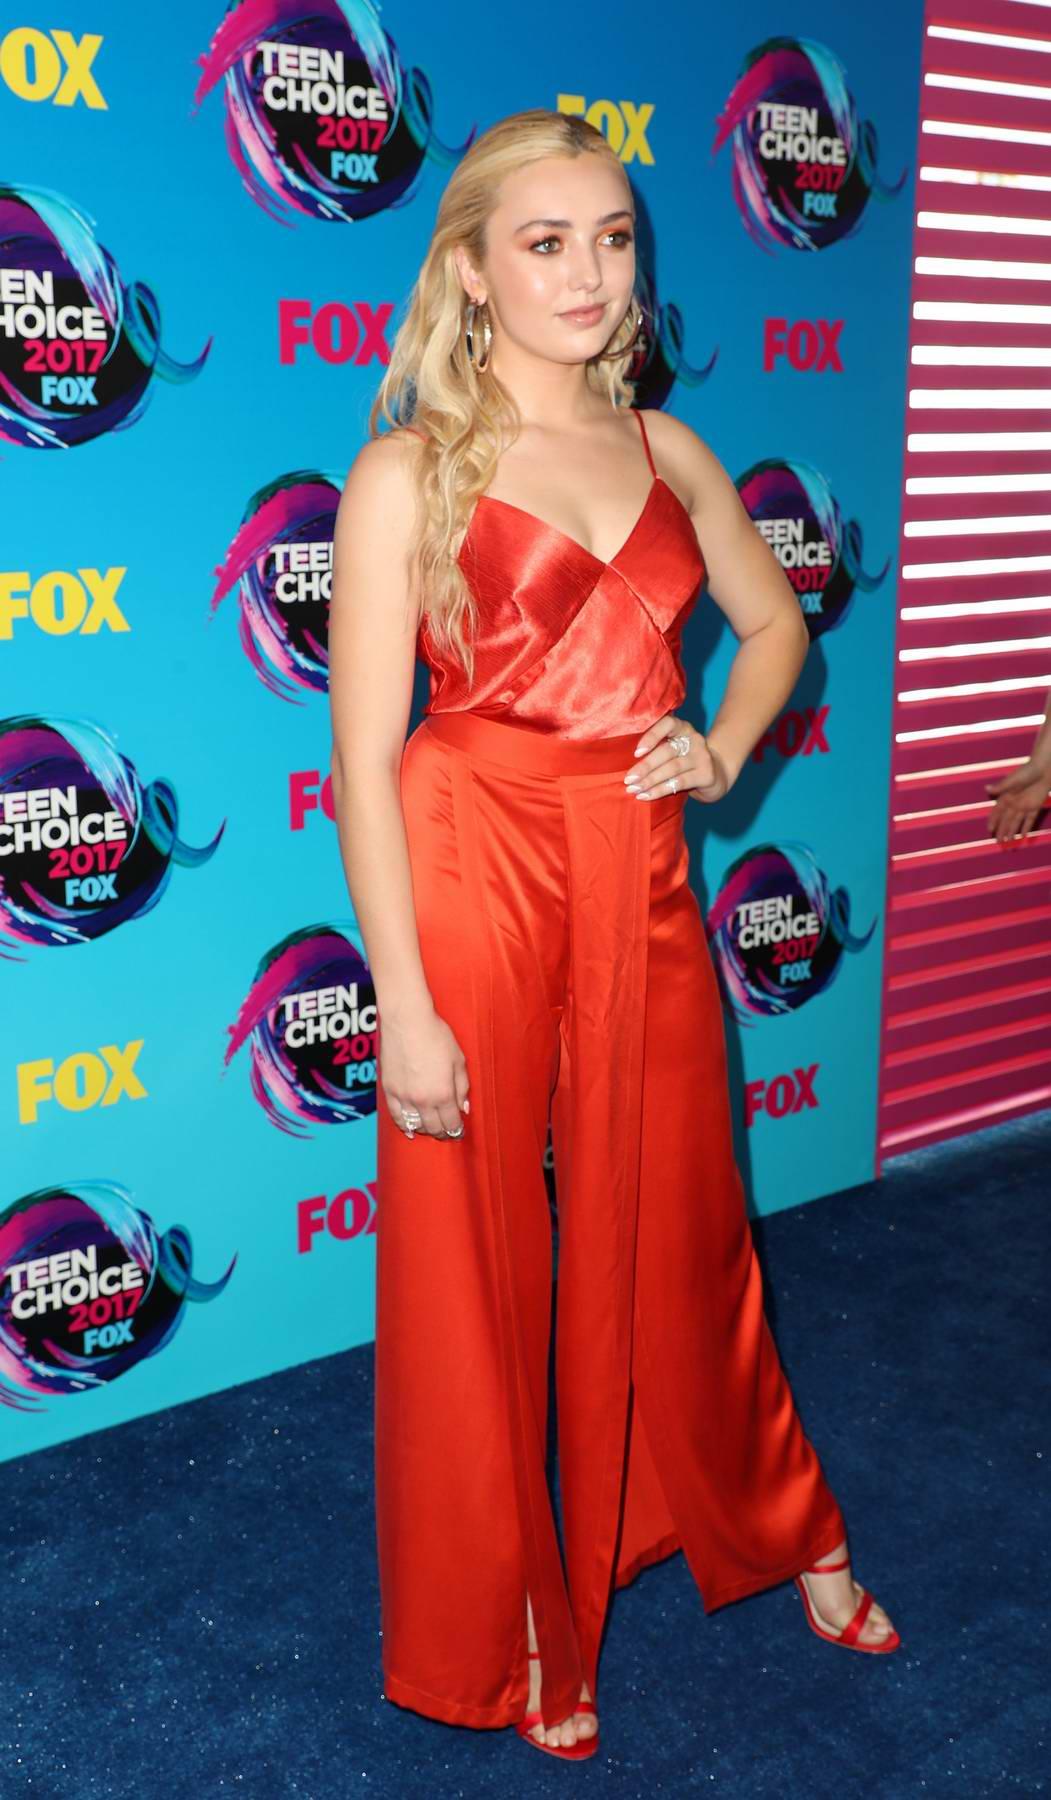 Peyton Roi List at Teen Choice Awards 2017 at Galen Center in Los Angeles